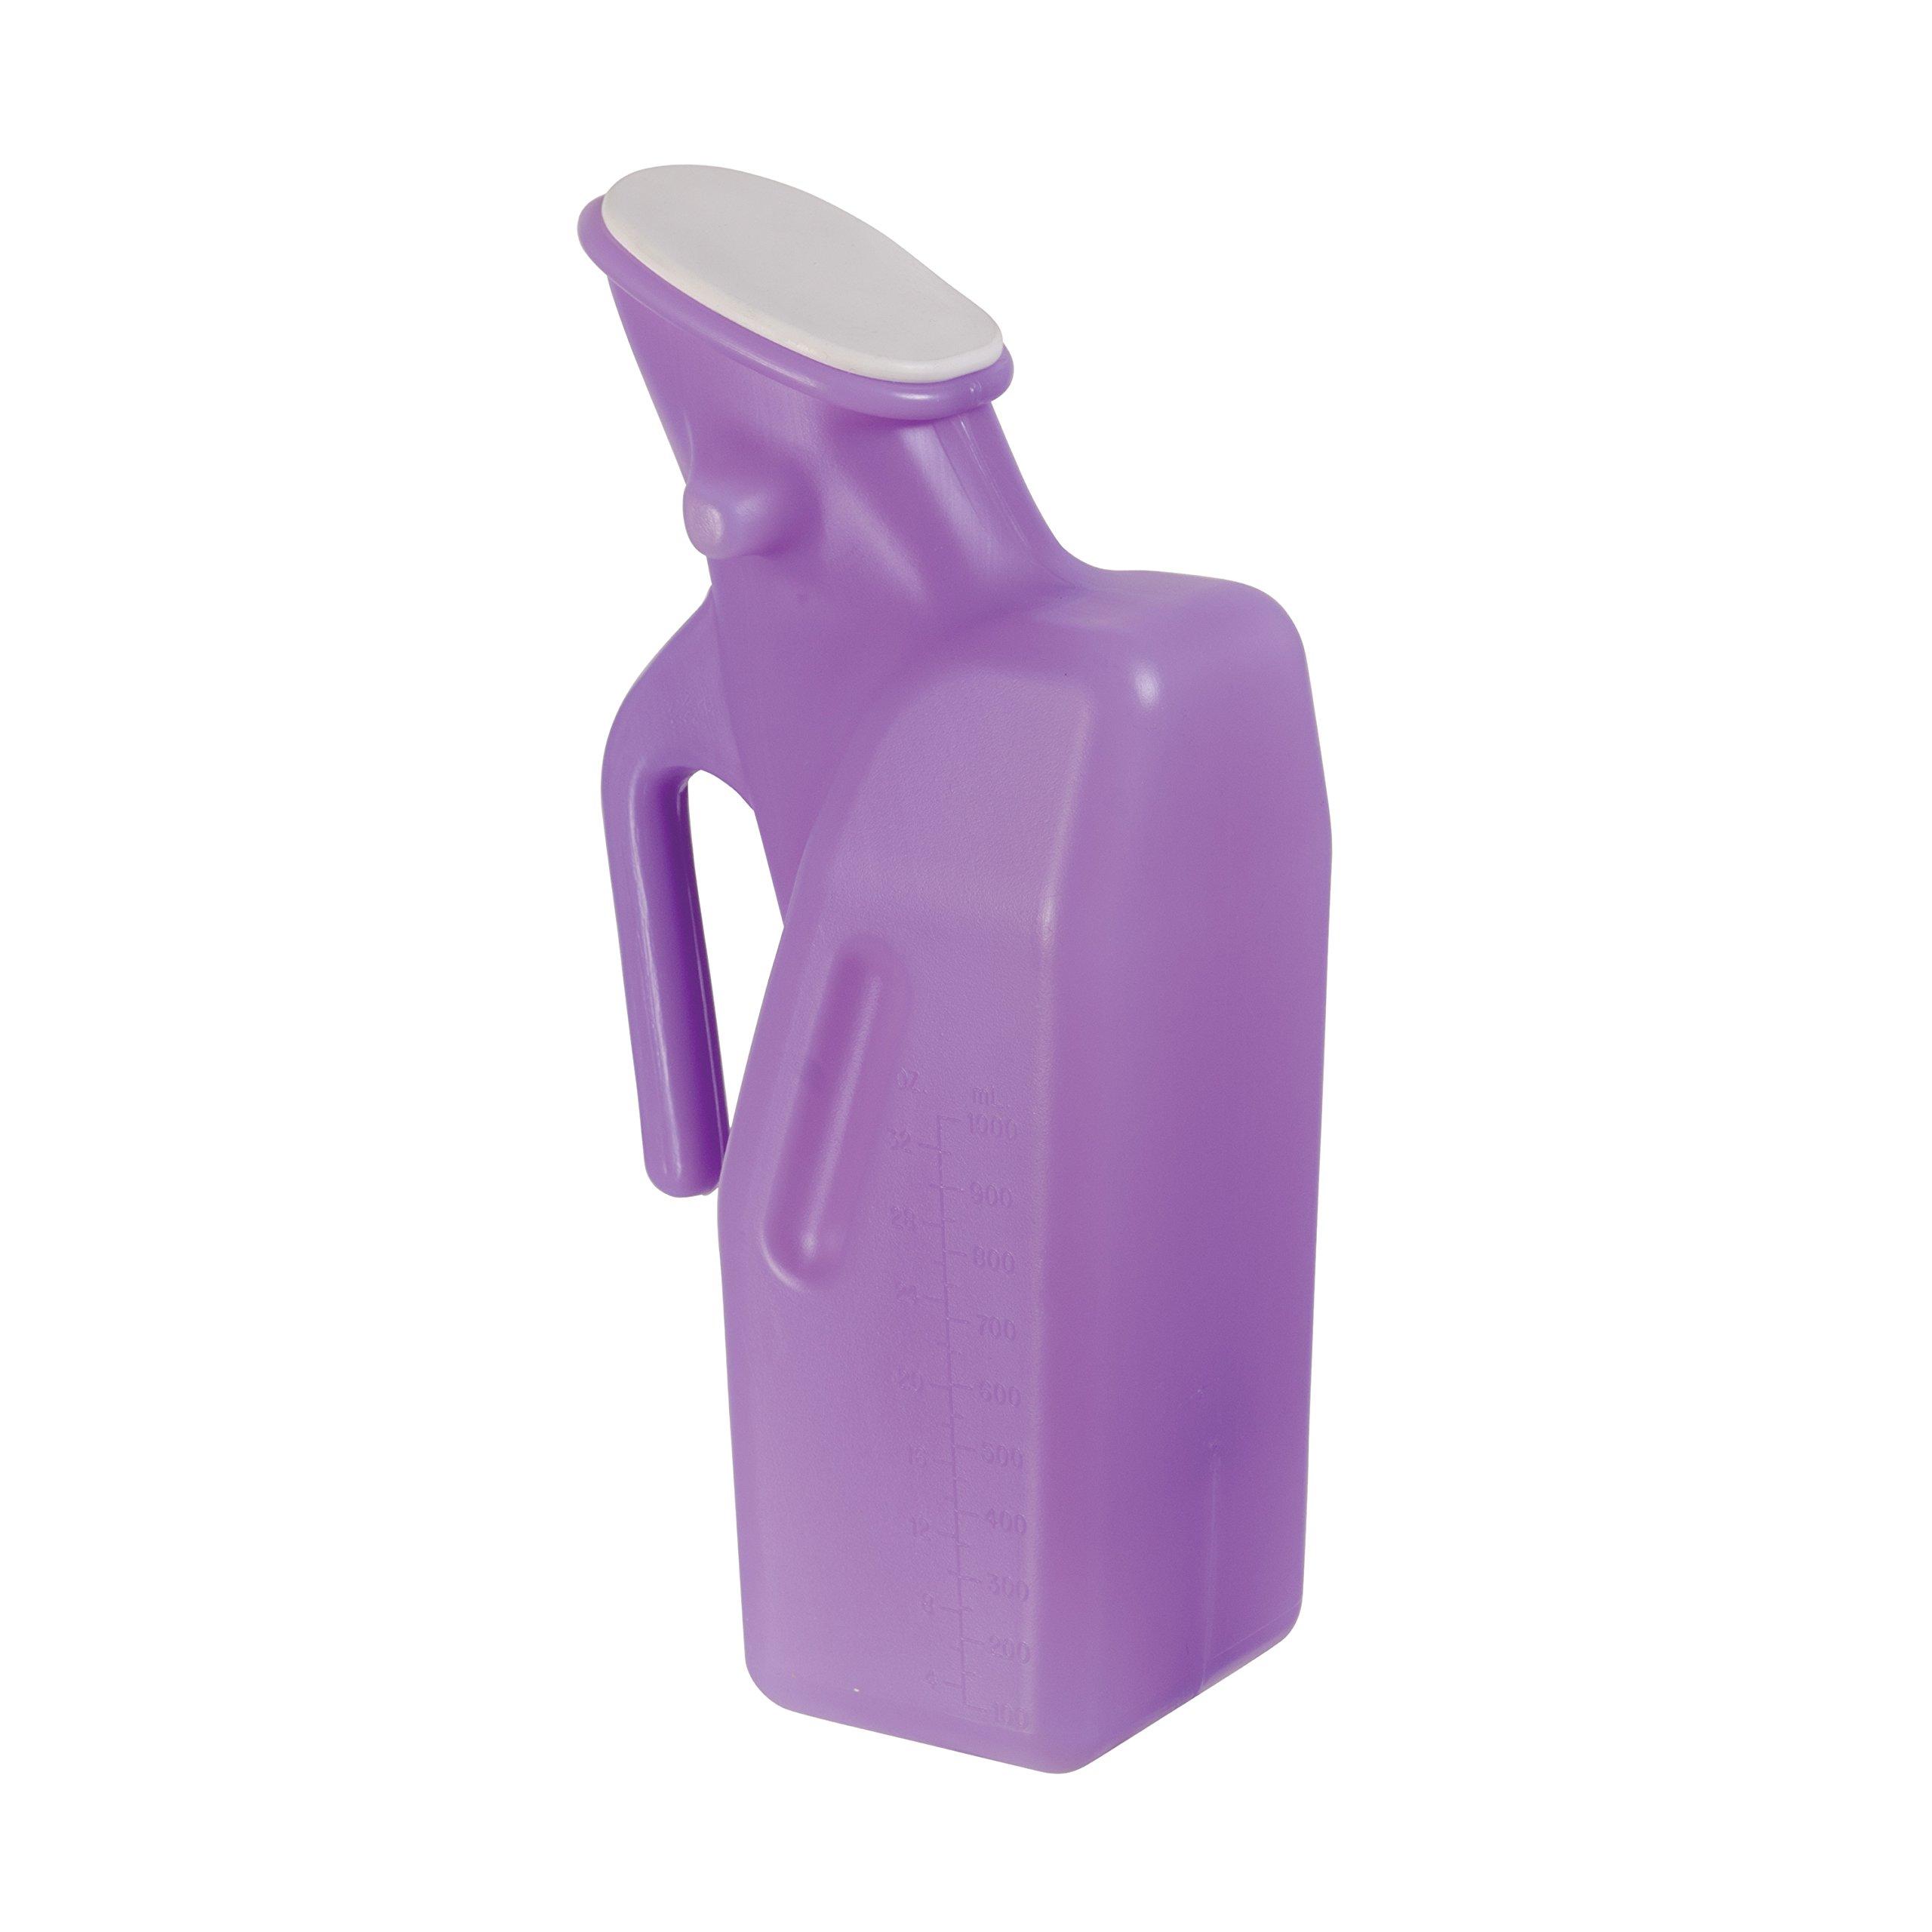 DMI Female Portable Urinal Bottle with Leak-Resistant Lid, Lightweight Shatter-Resistant Plastic, 1 Quart Capacity, Autoclavable, Purple by DMI